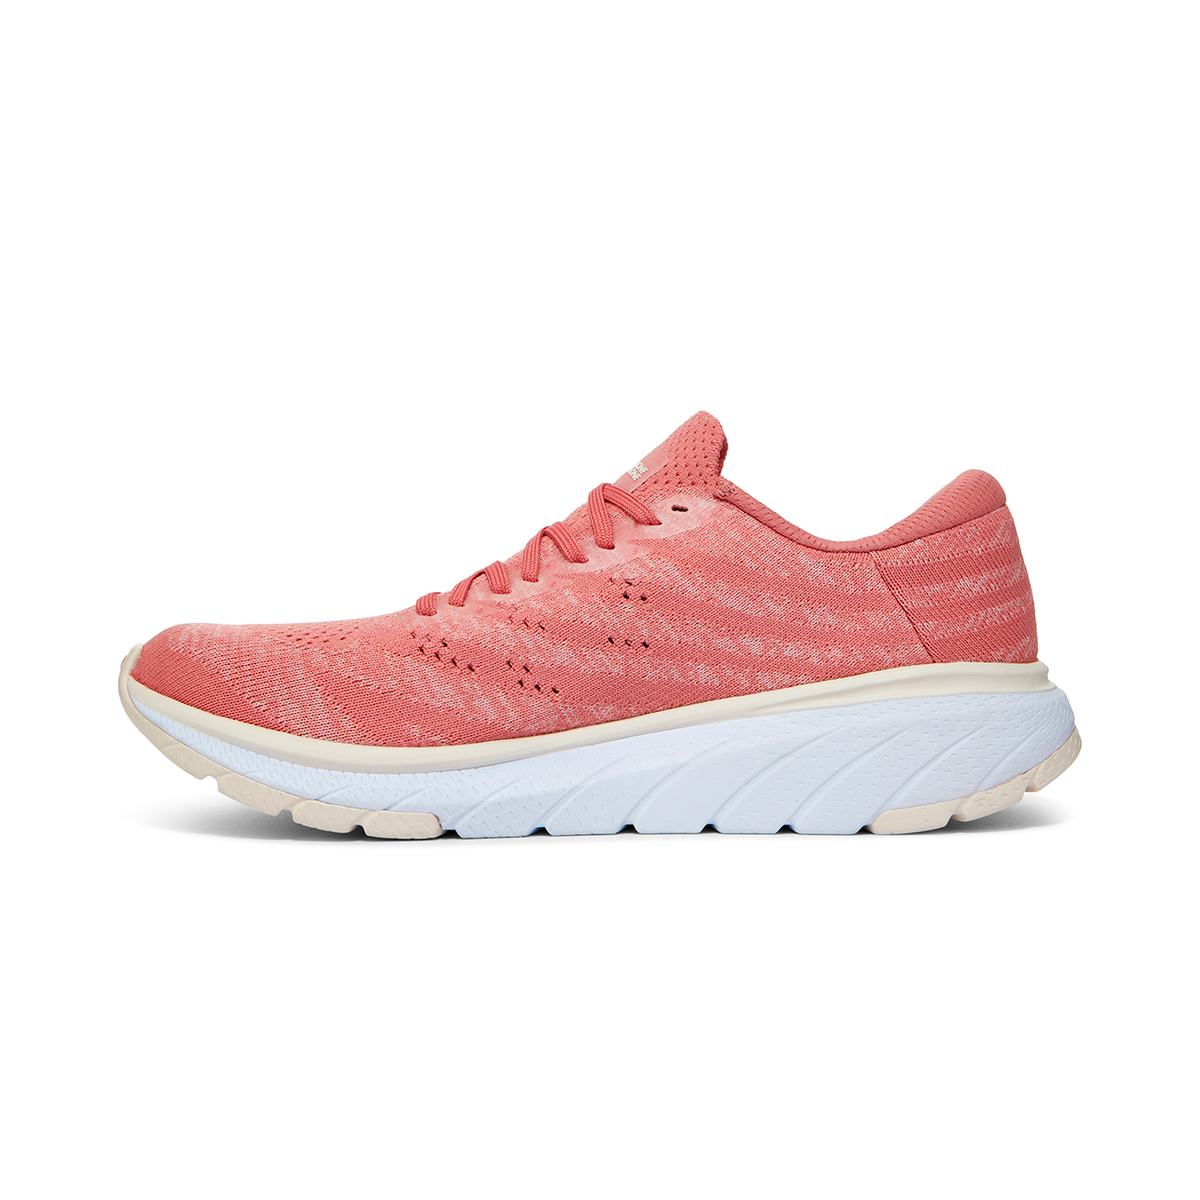 Women's Hoka One One Cavu 3 Running Shoe - Color: Lantana/Eggnog - Size: 5 - Width: Regular, Lantana/Eggnog, large, image 2